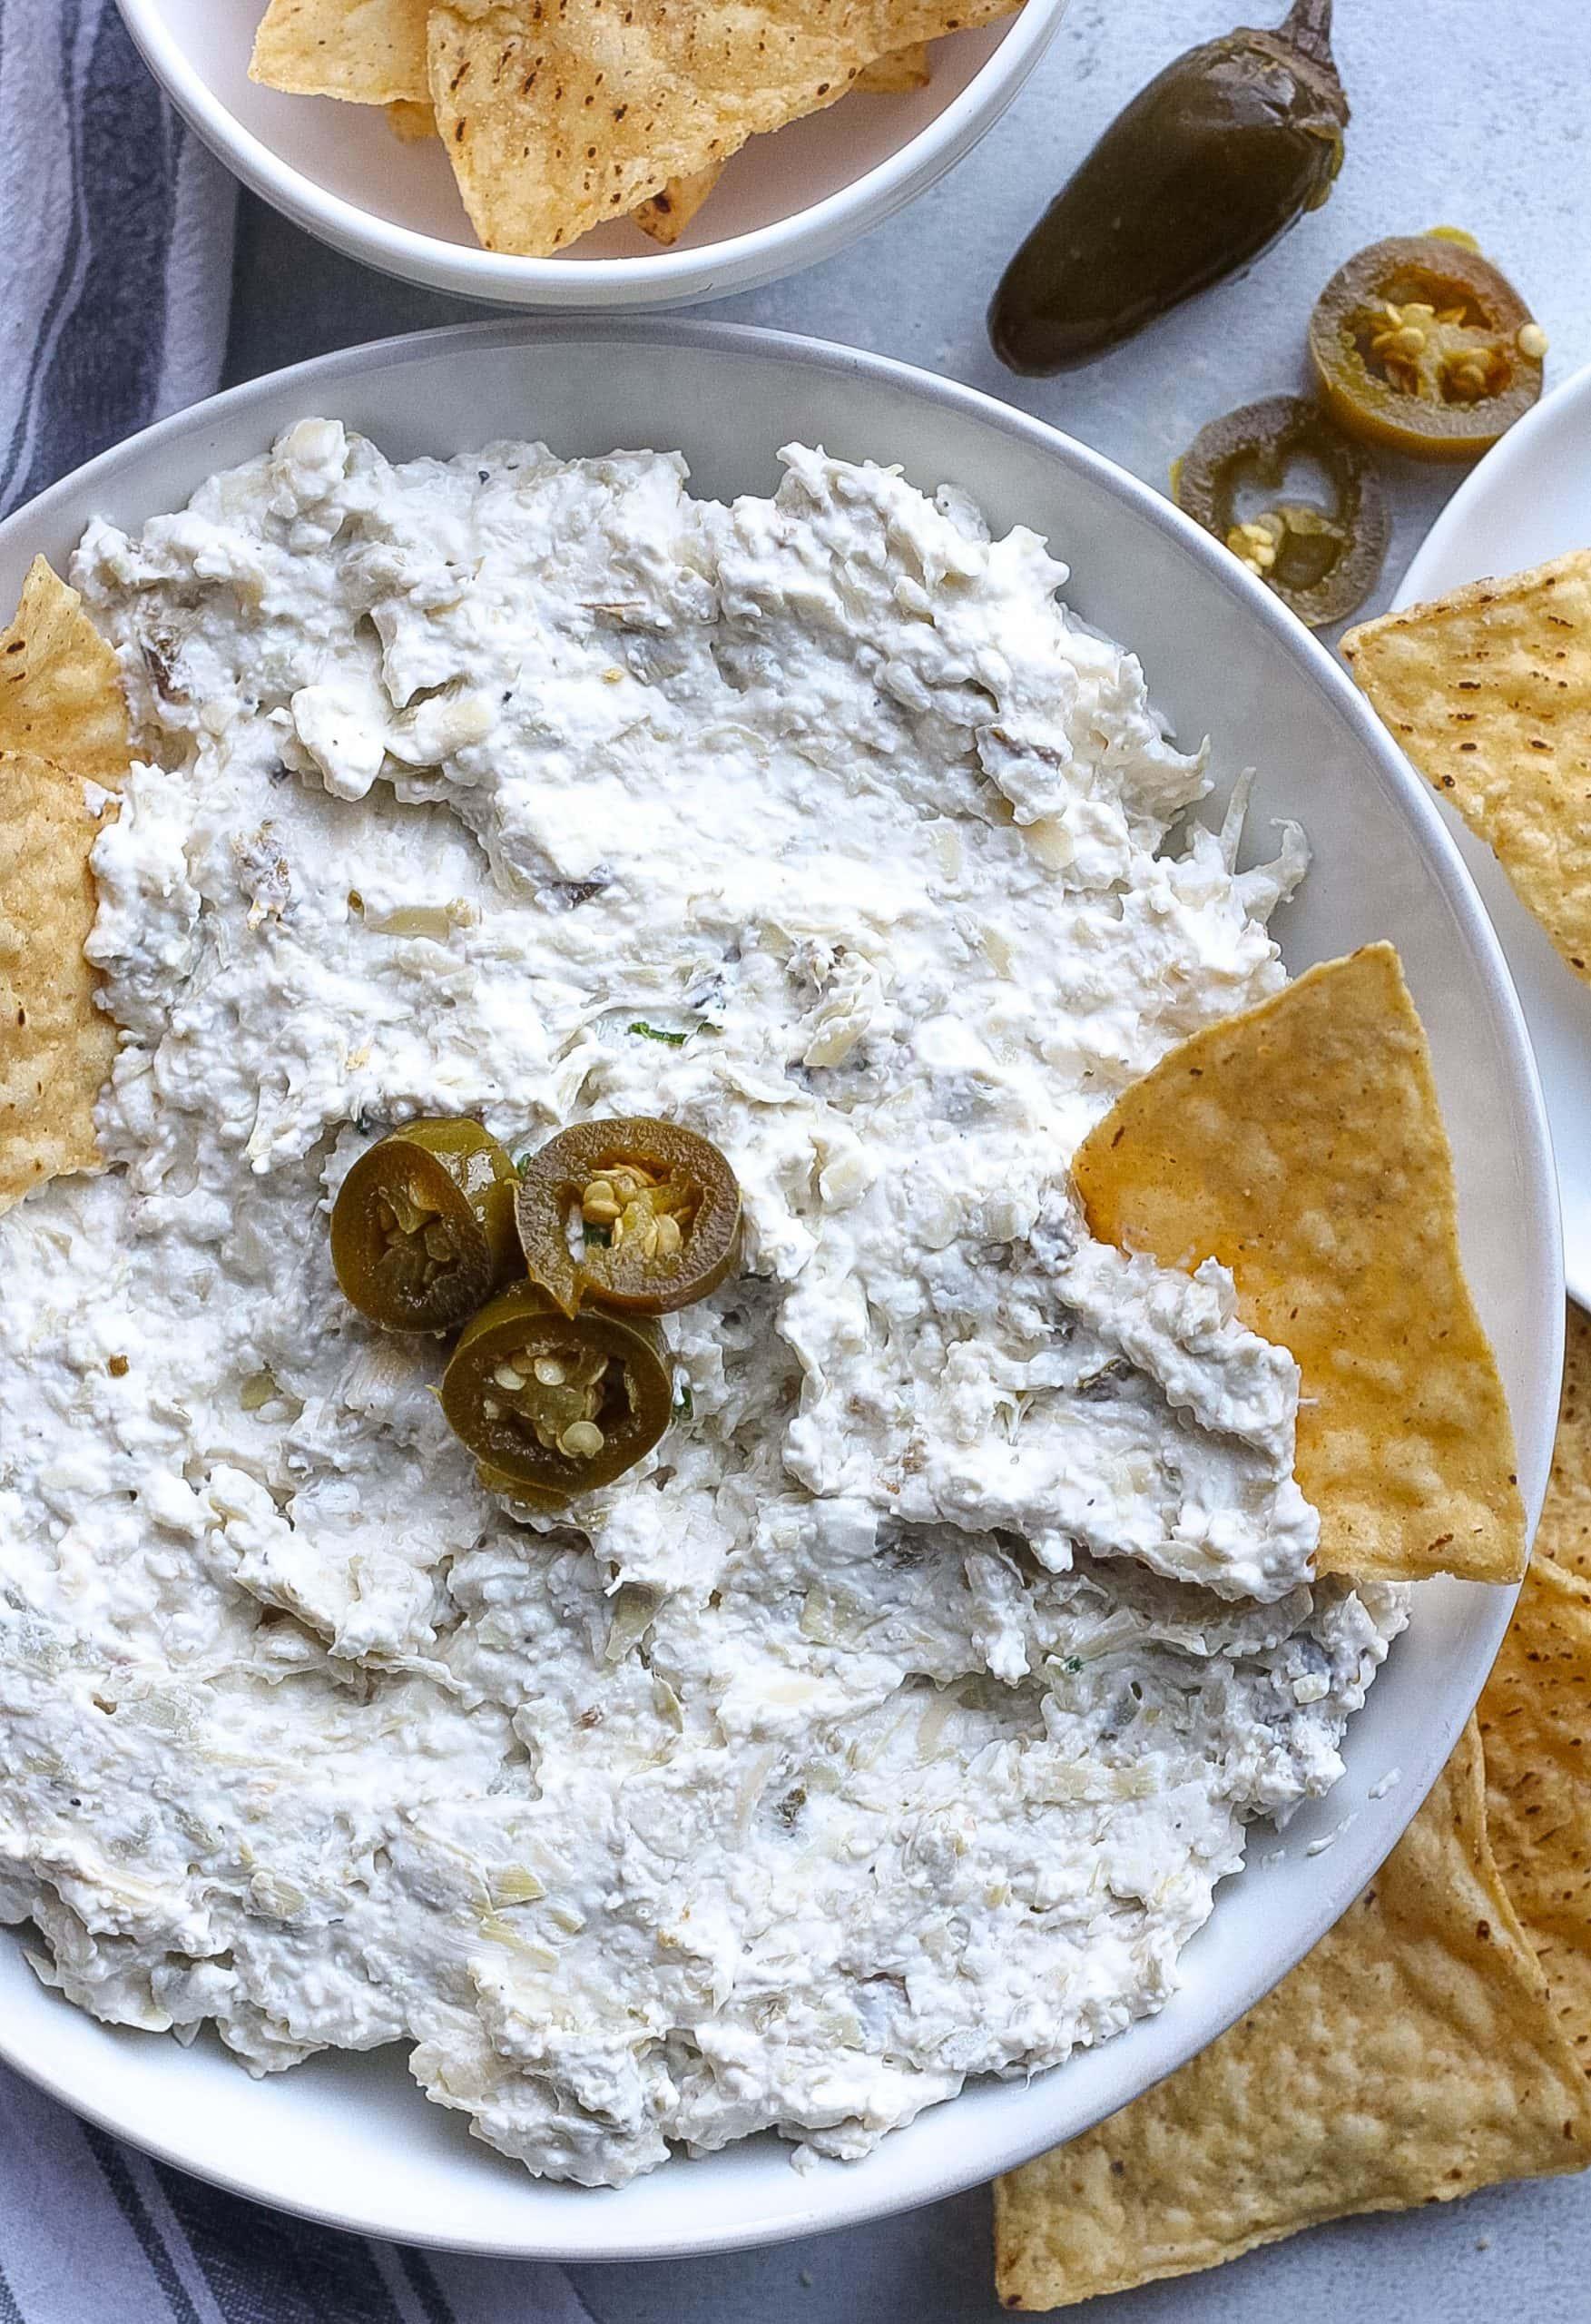 Artichoke Jalapeño Dip with chips